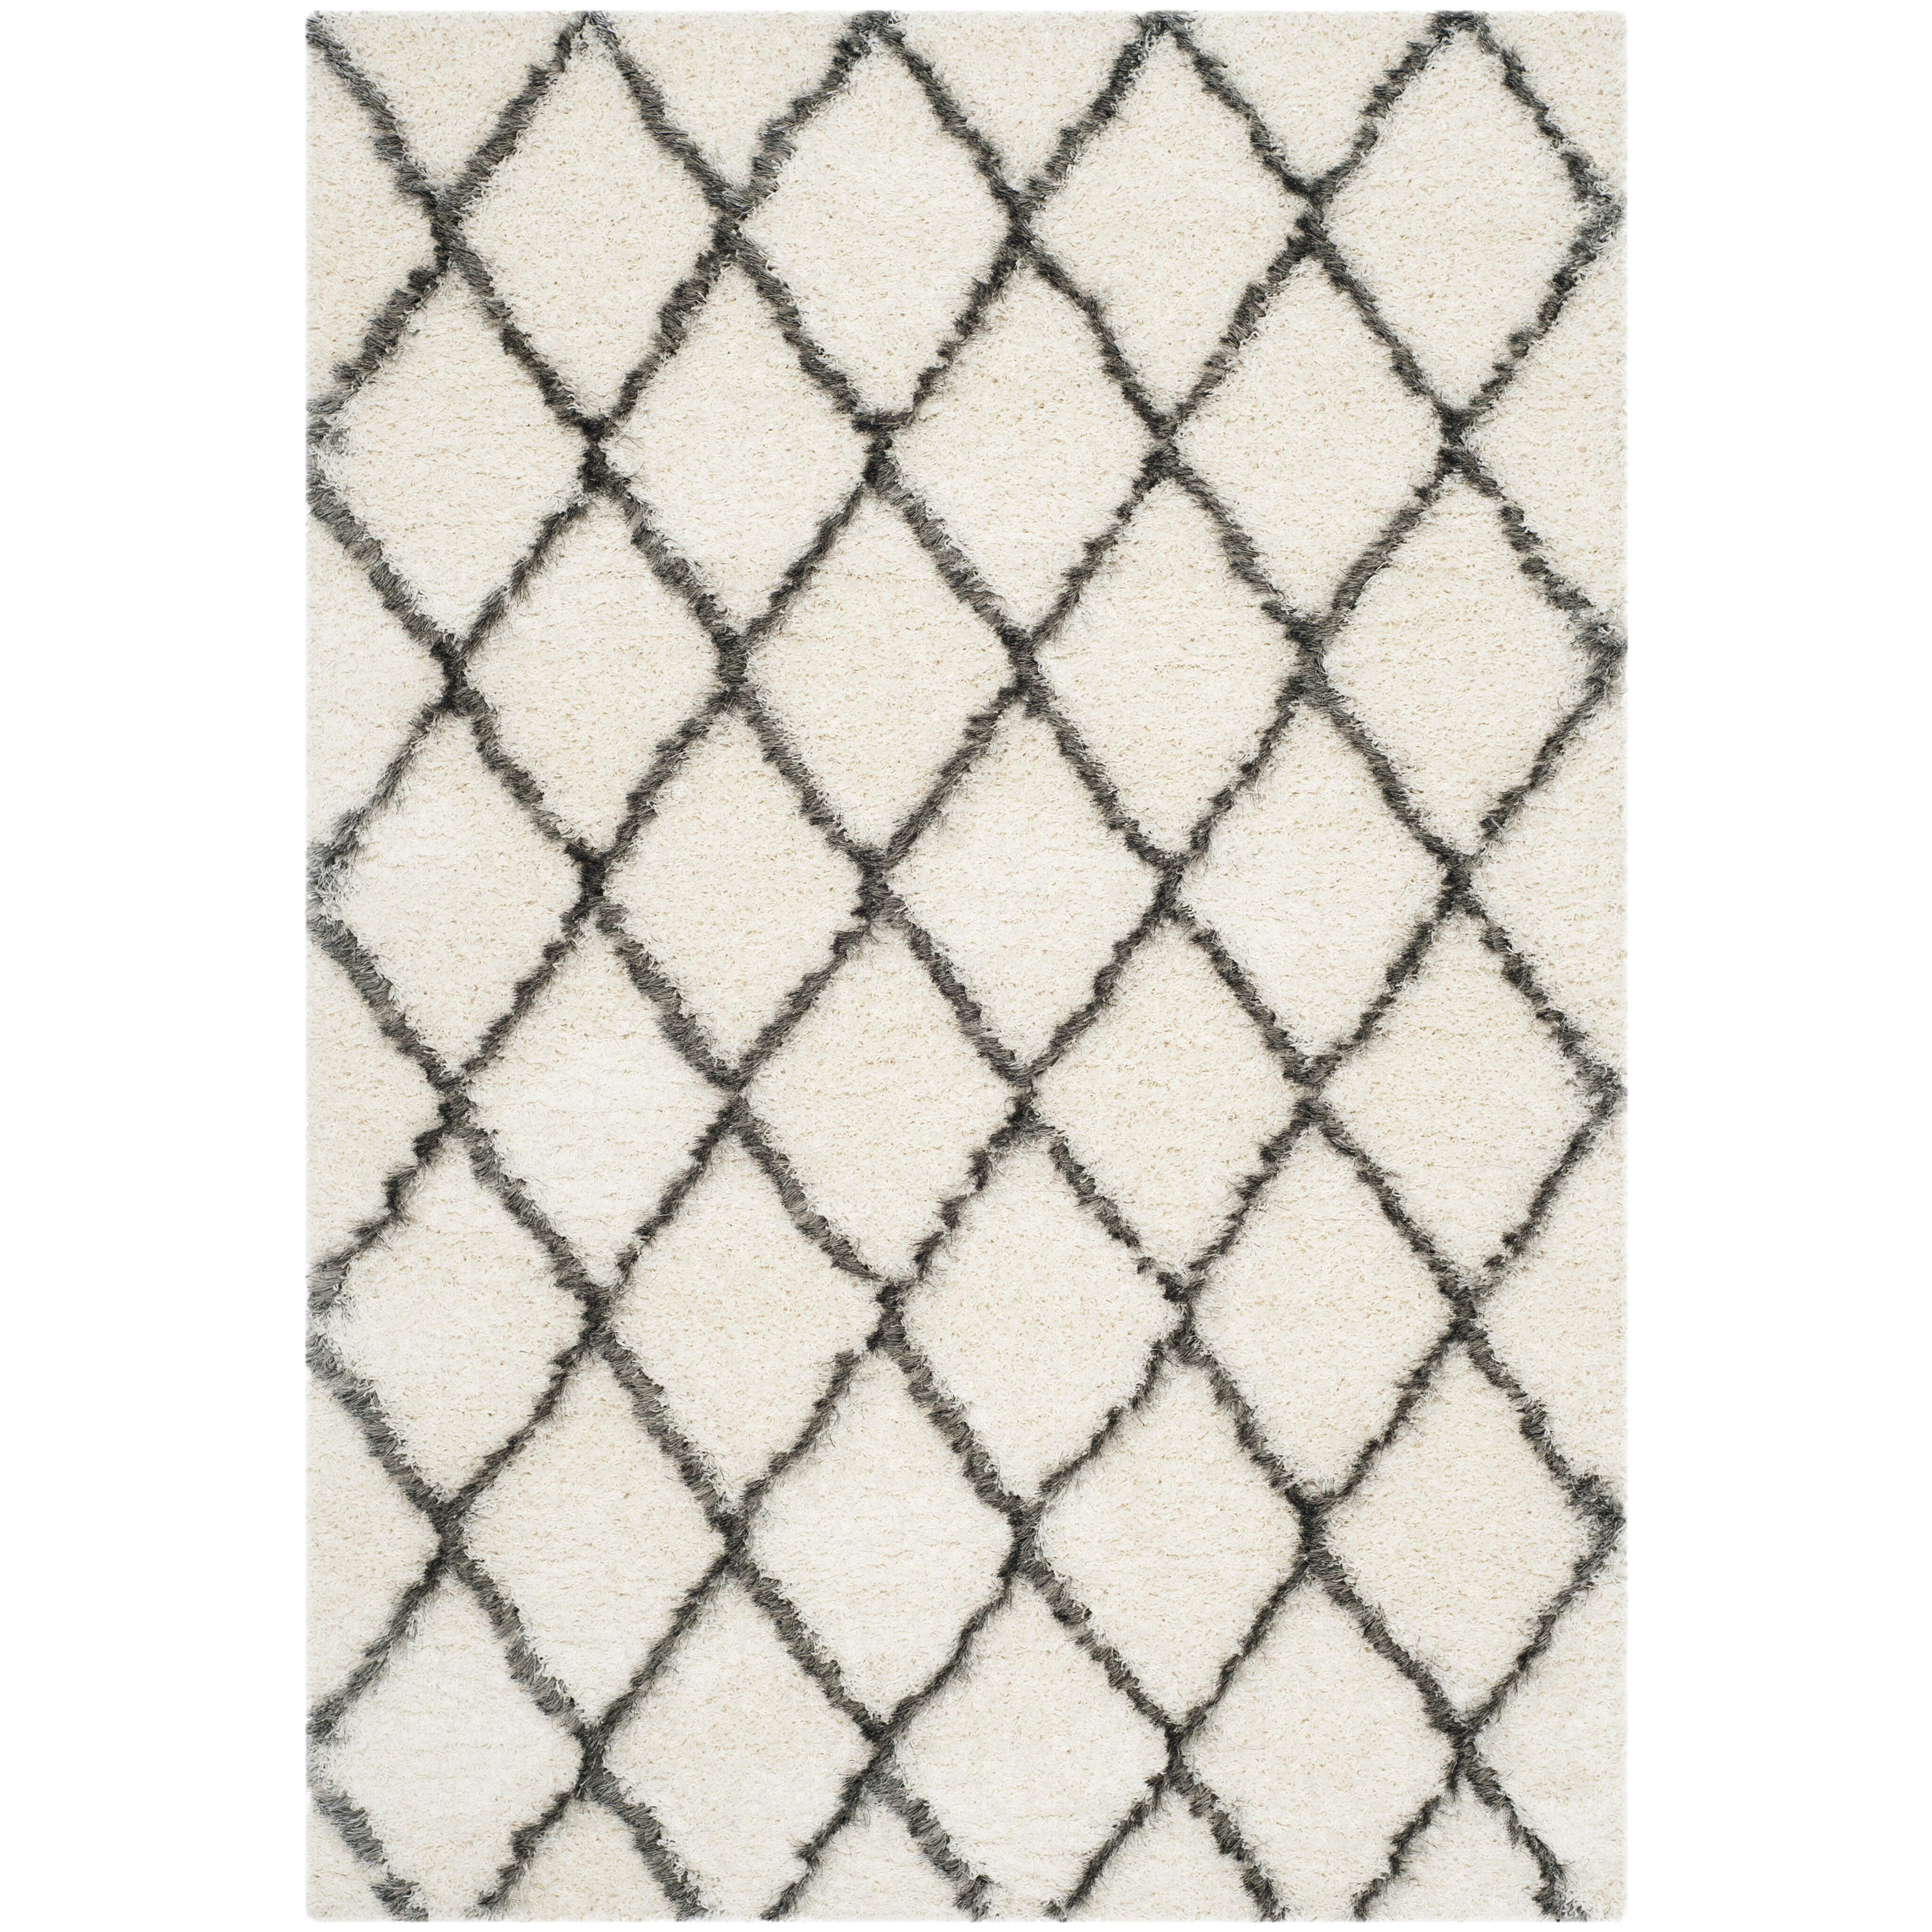 ^ Brayden Studio Sewell Moroccan Shag Ivory/Grey Geometric ...